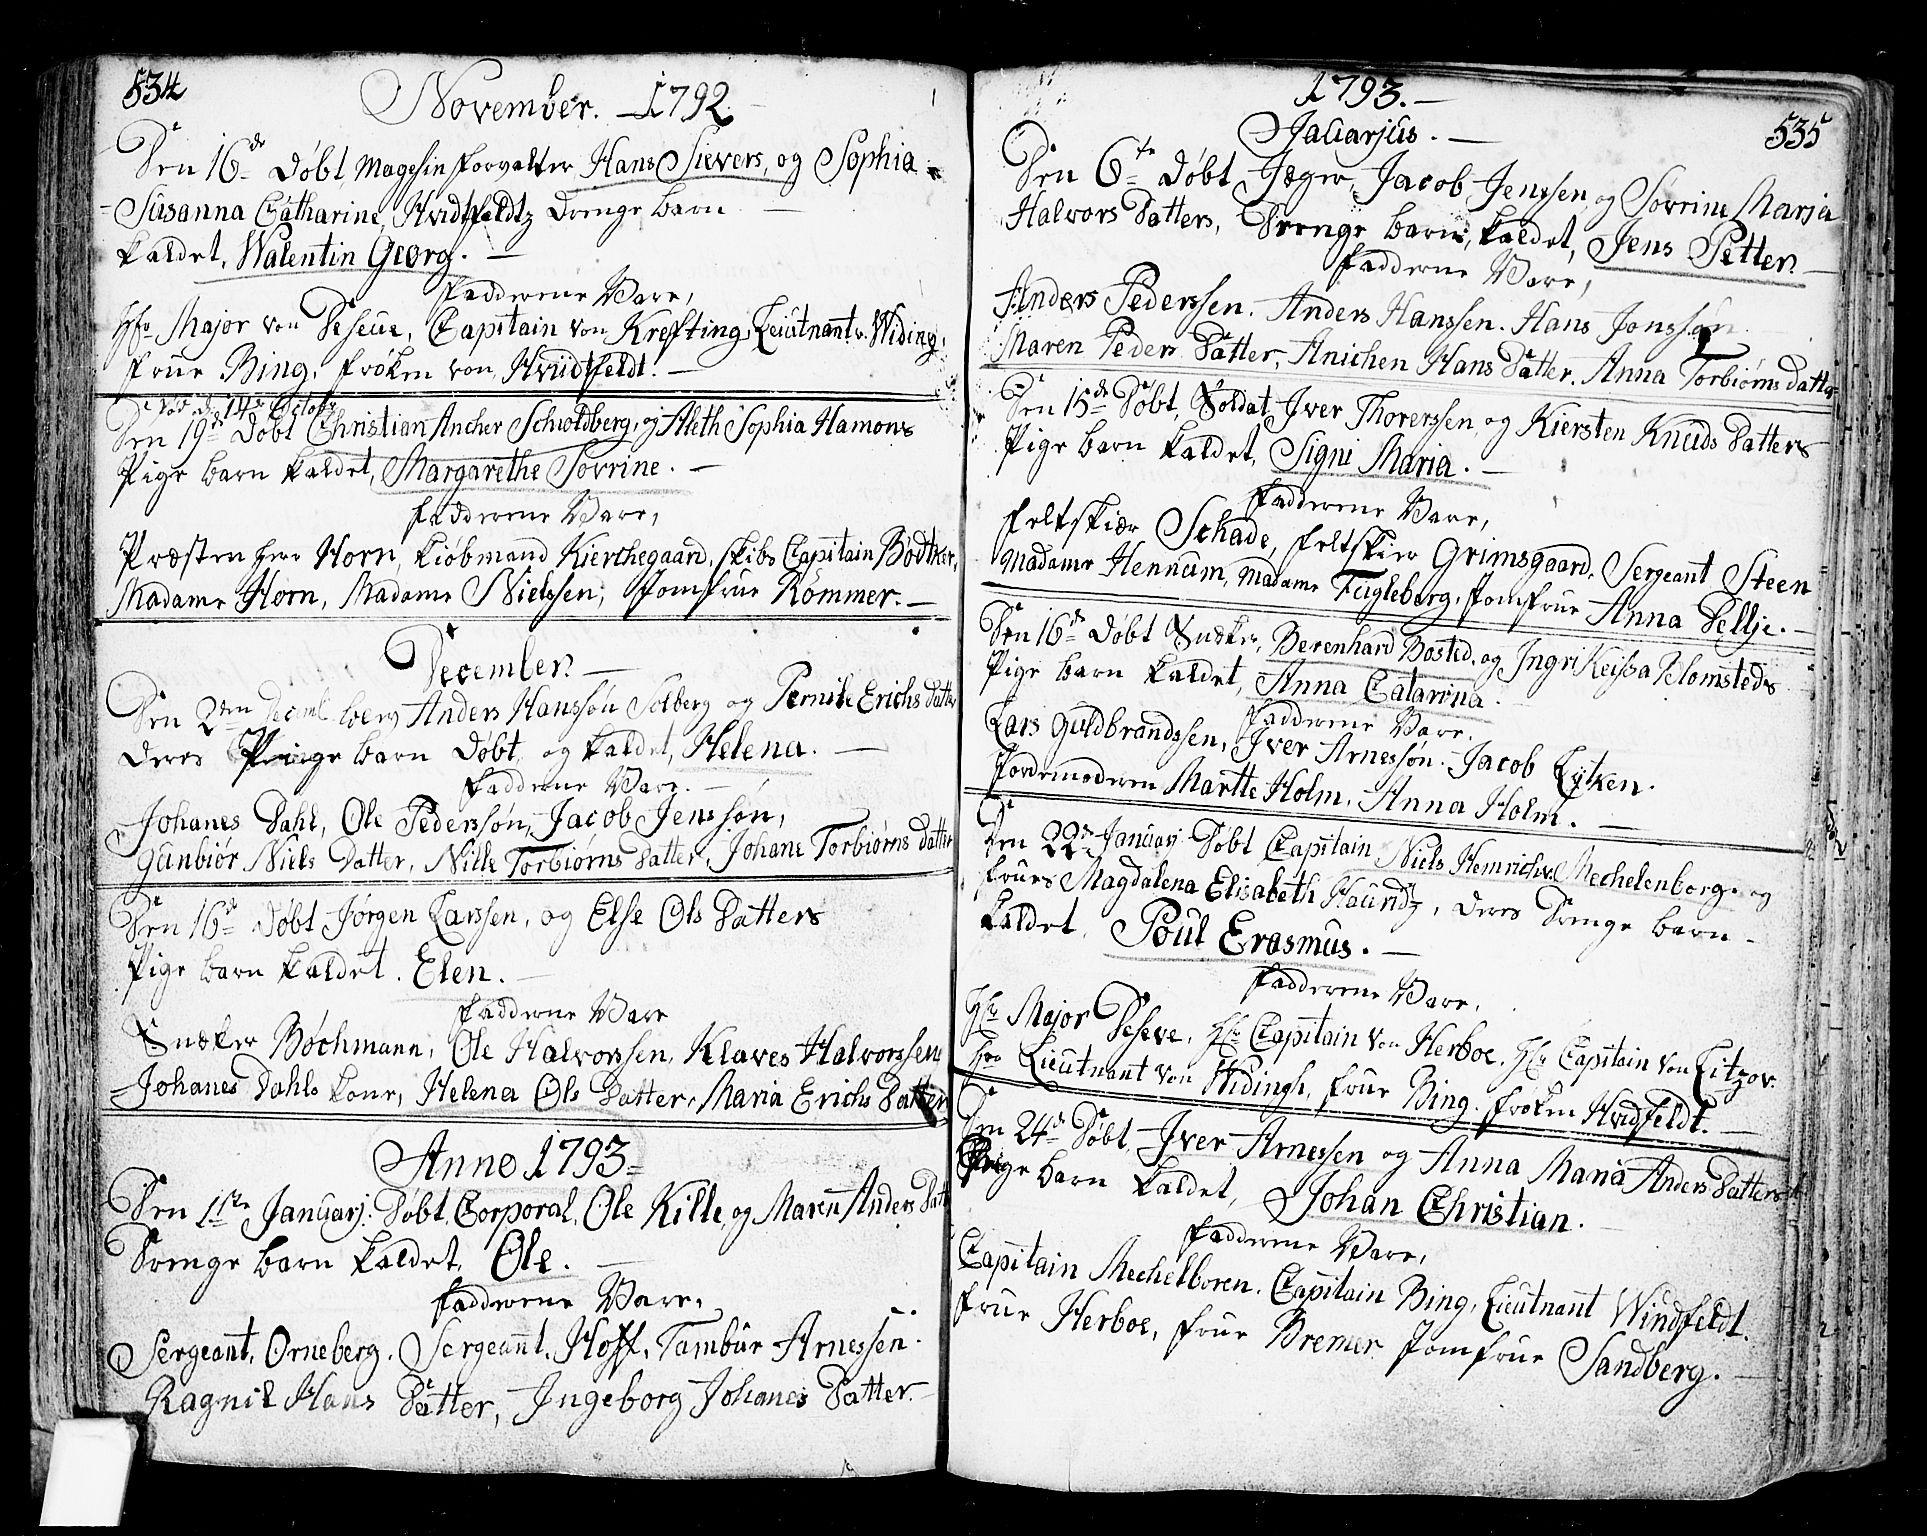 SAO, Fredrikstad prestekontor Kirkebøker, F/Fa/L0002: Parish register (official) no. 2, 1750-1804, p. 534-535